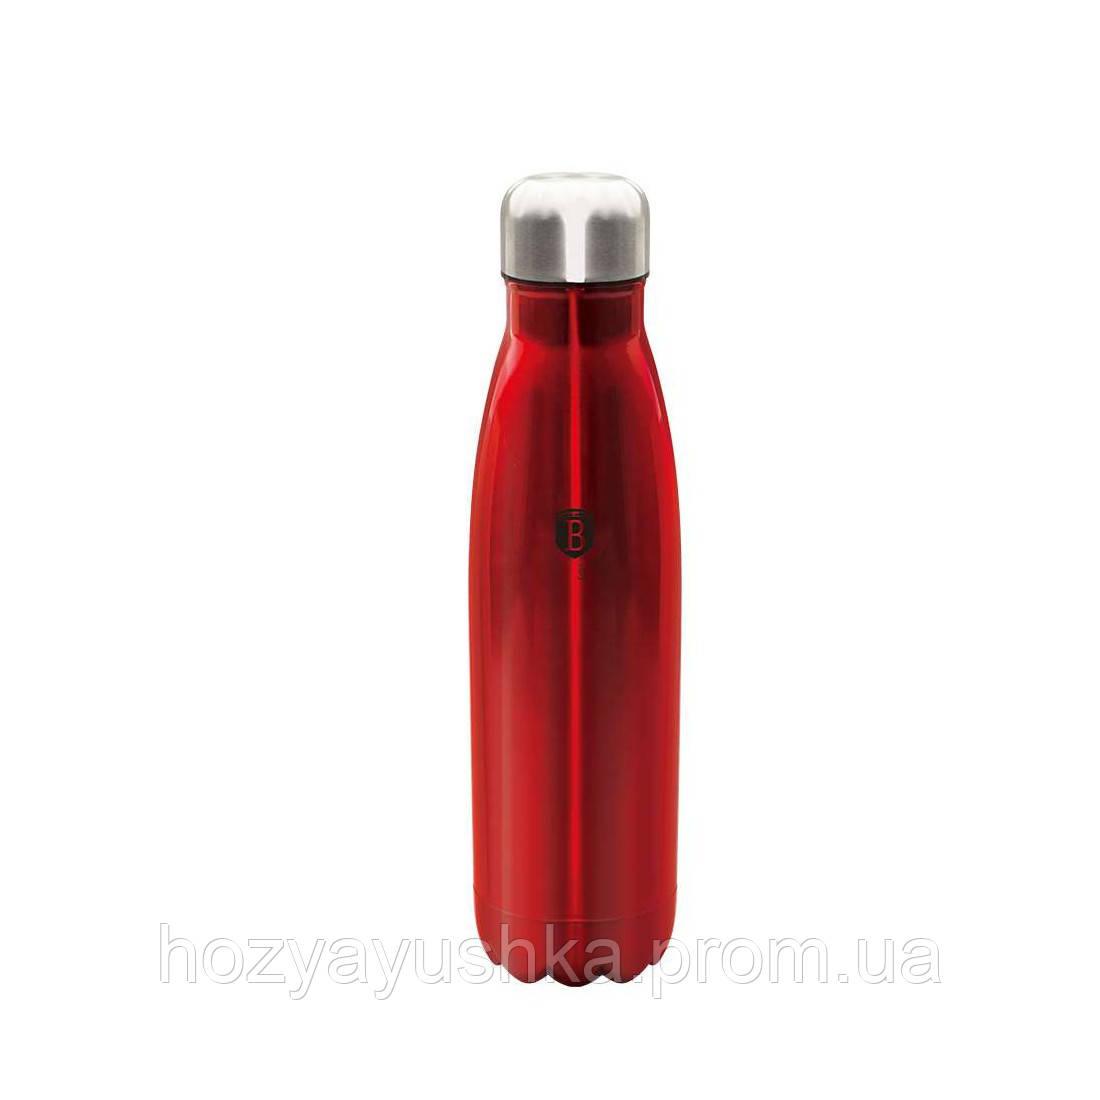 Термос-бутылка Berlinger Haus Burgundy Metallic Line BH-1759 - 0.5 л